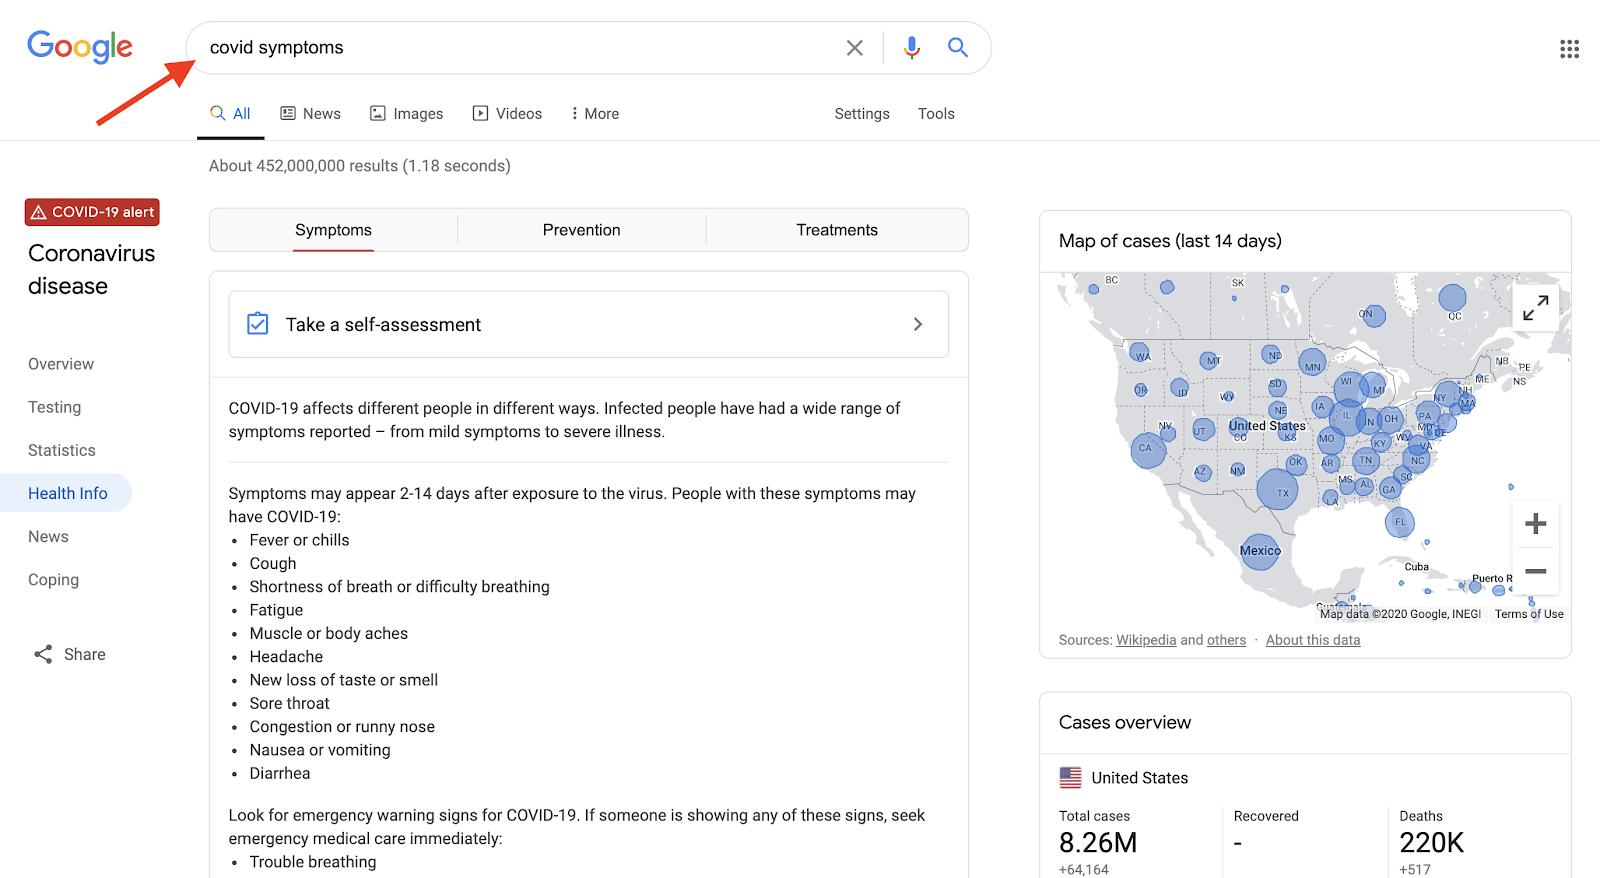 COVID Symptoms on Google